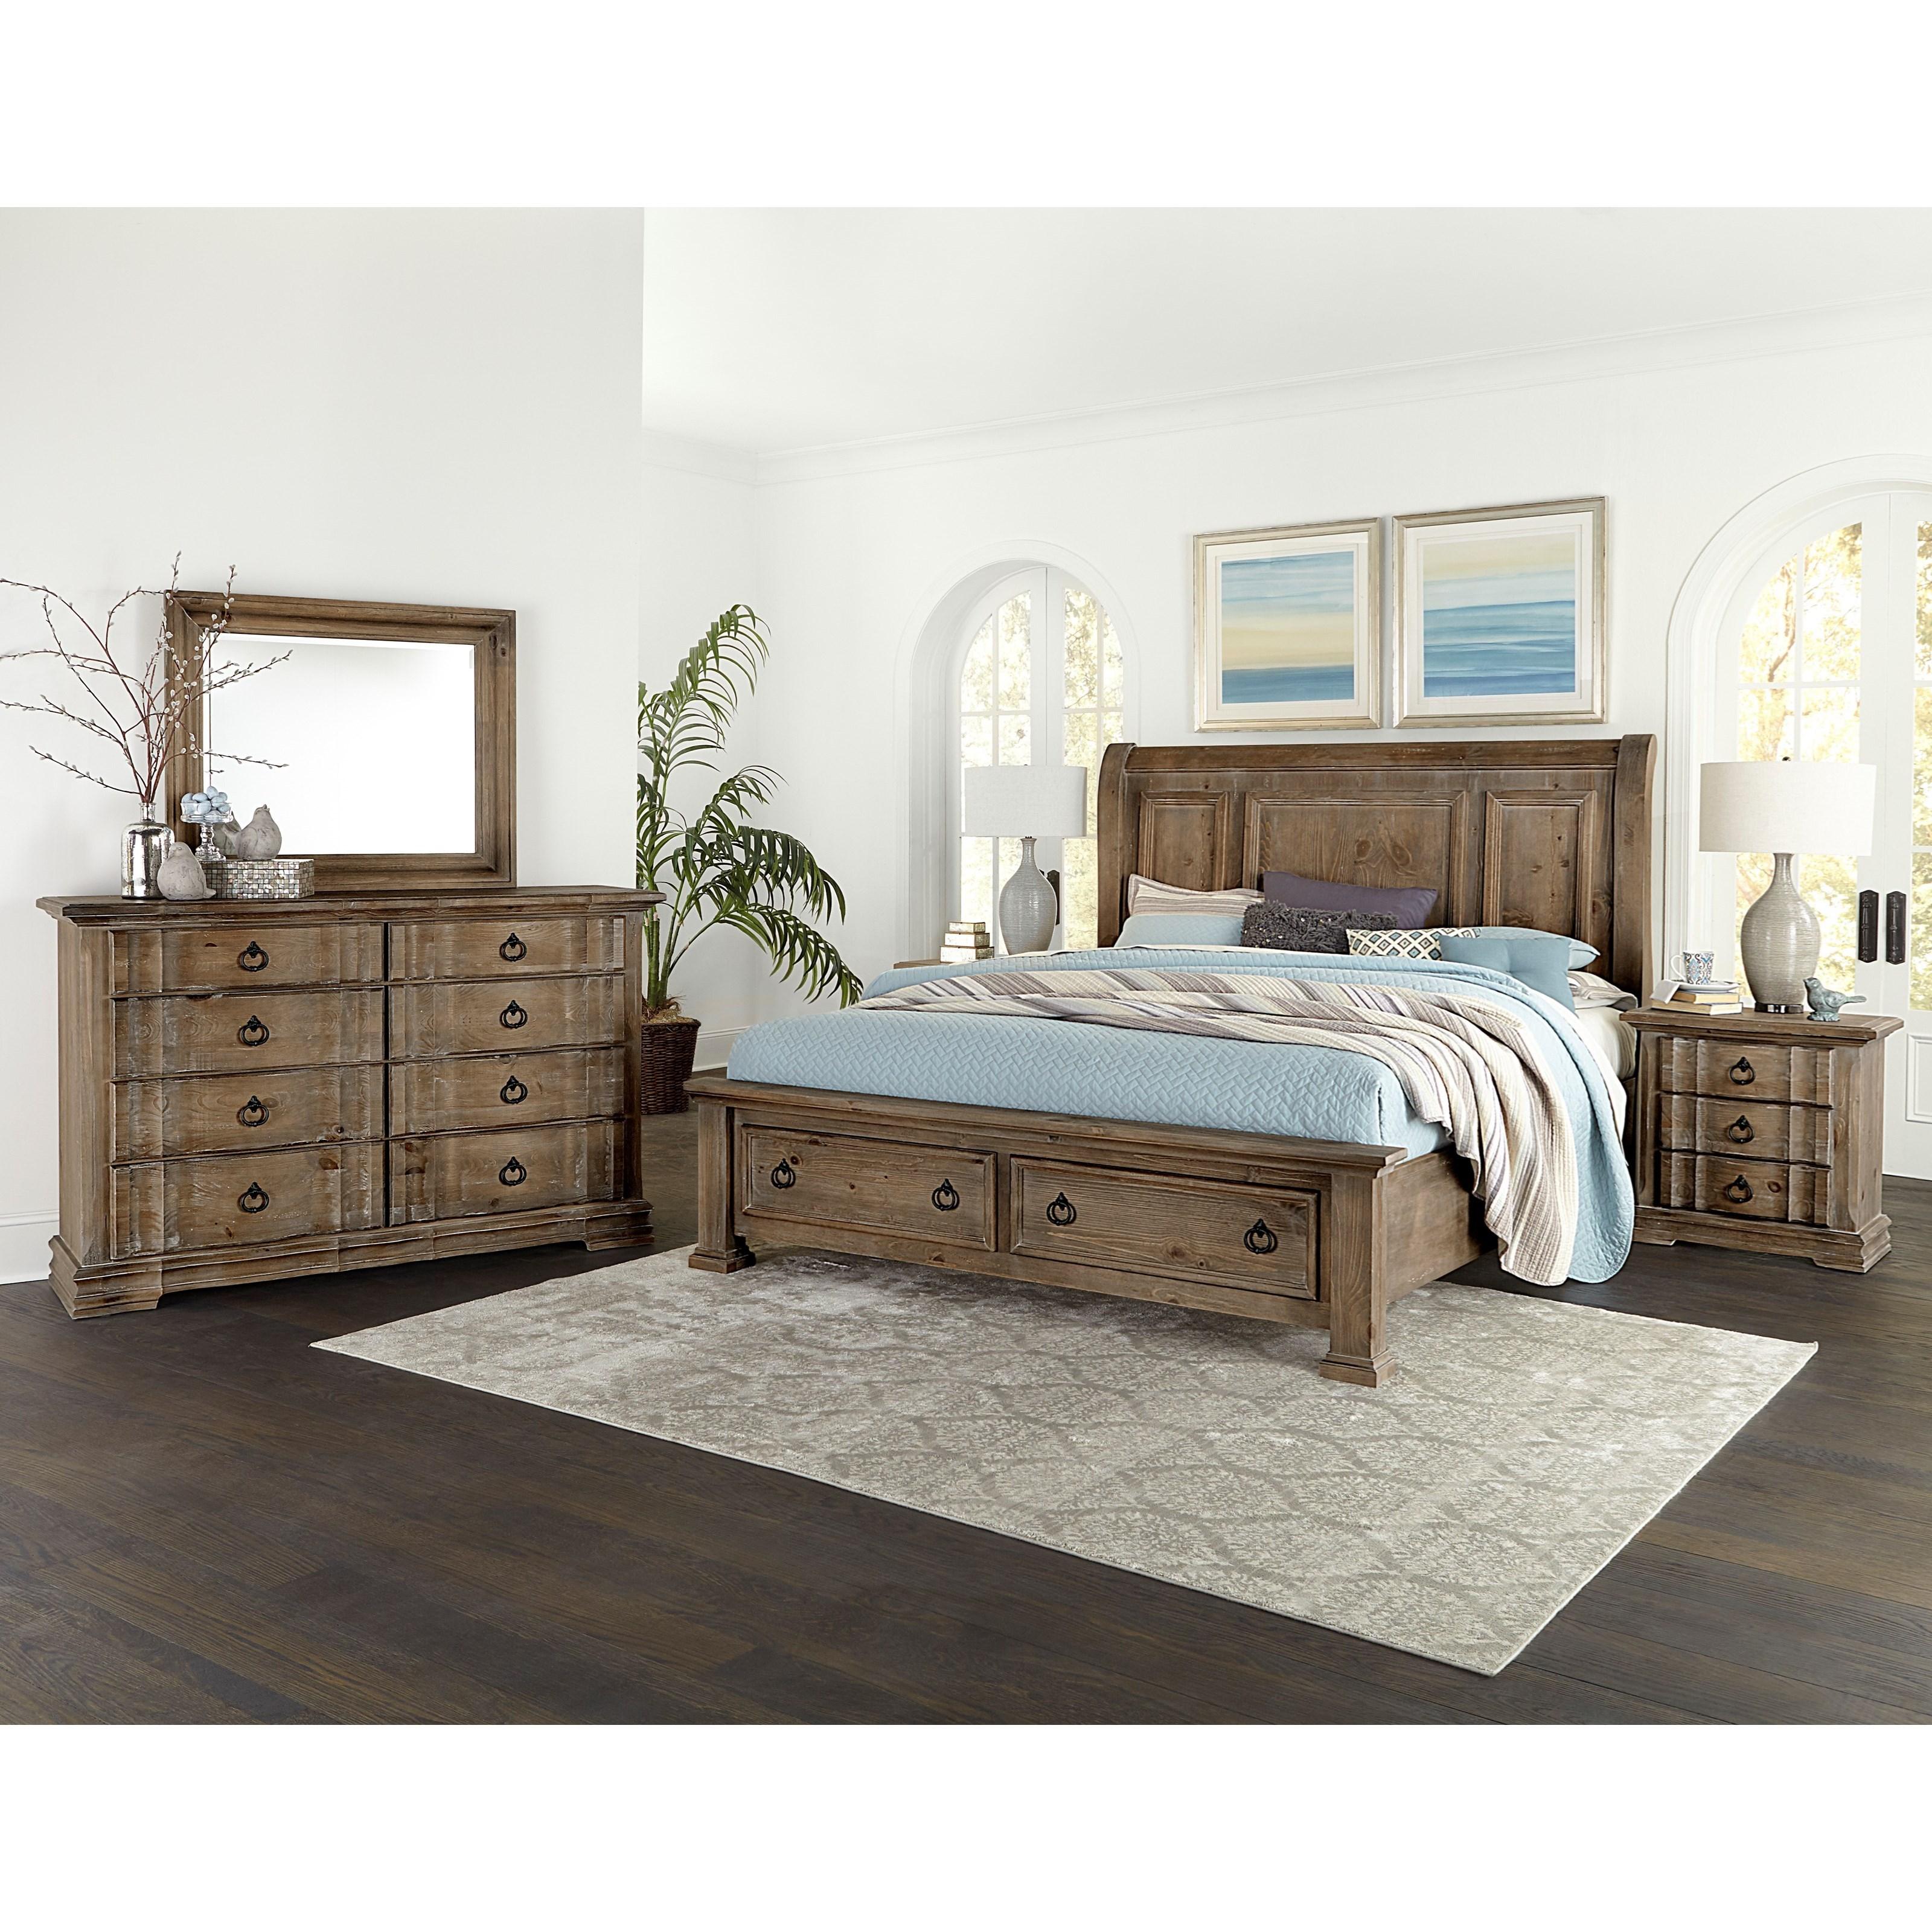 Vaughan Bassett Rustic Hills King Bedroom Group